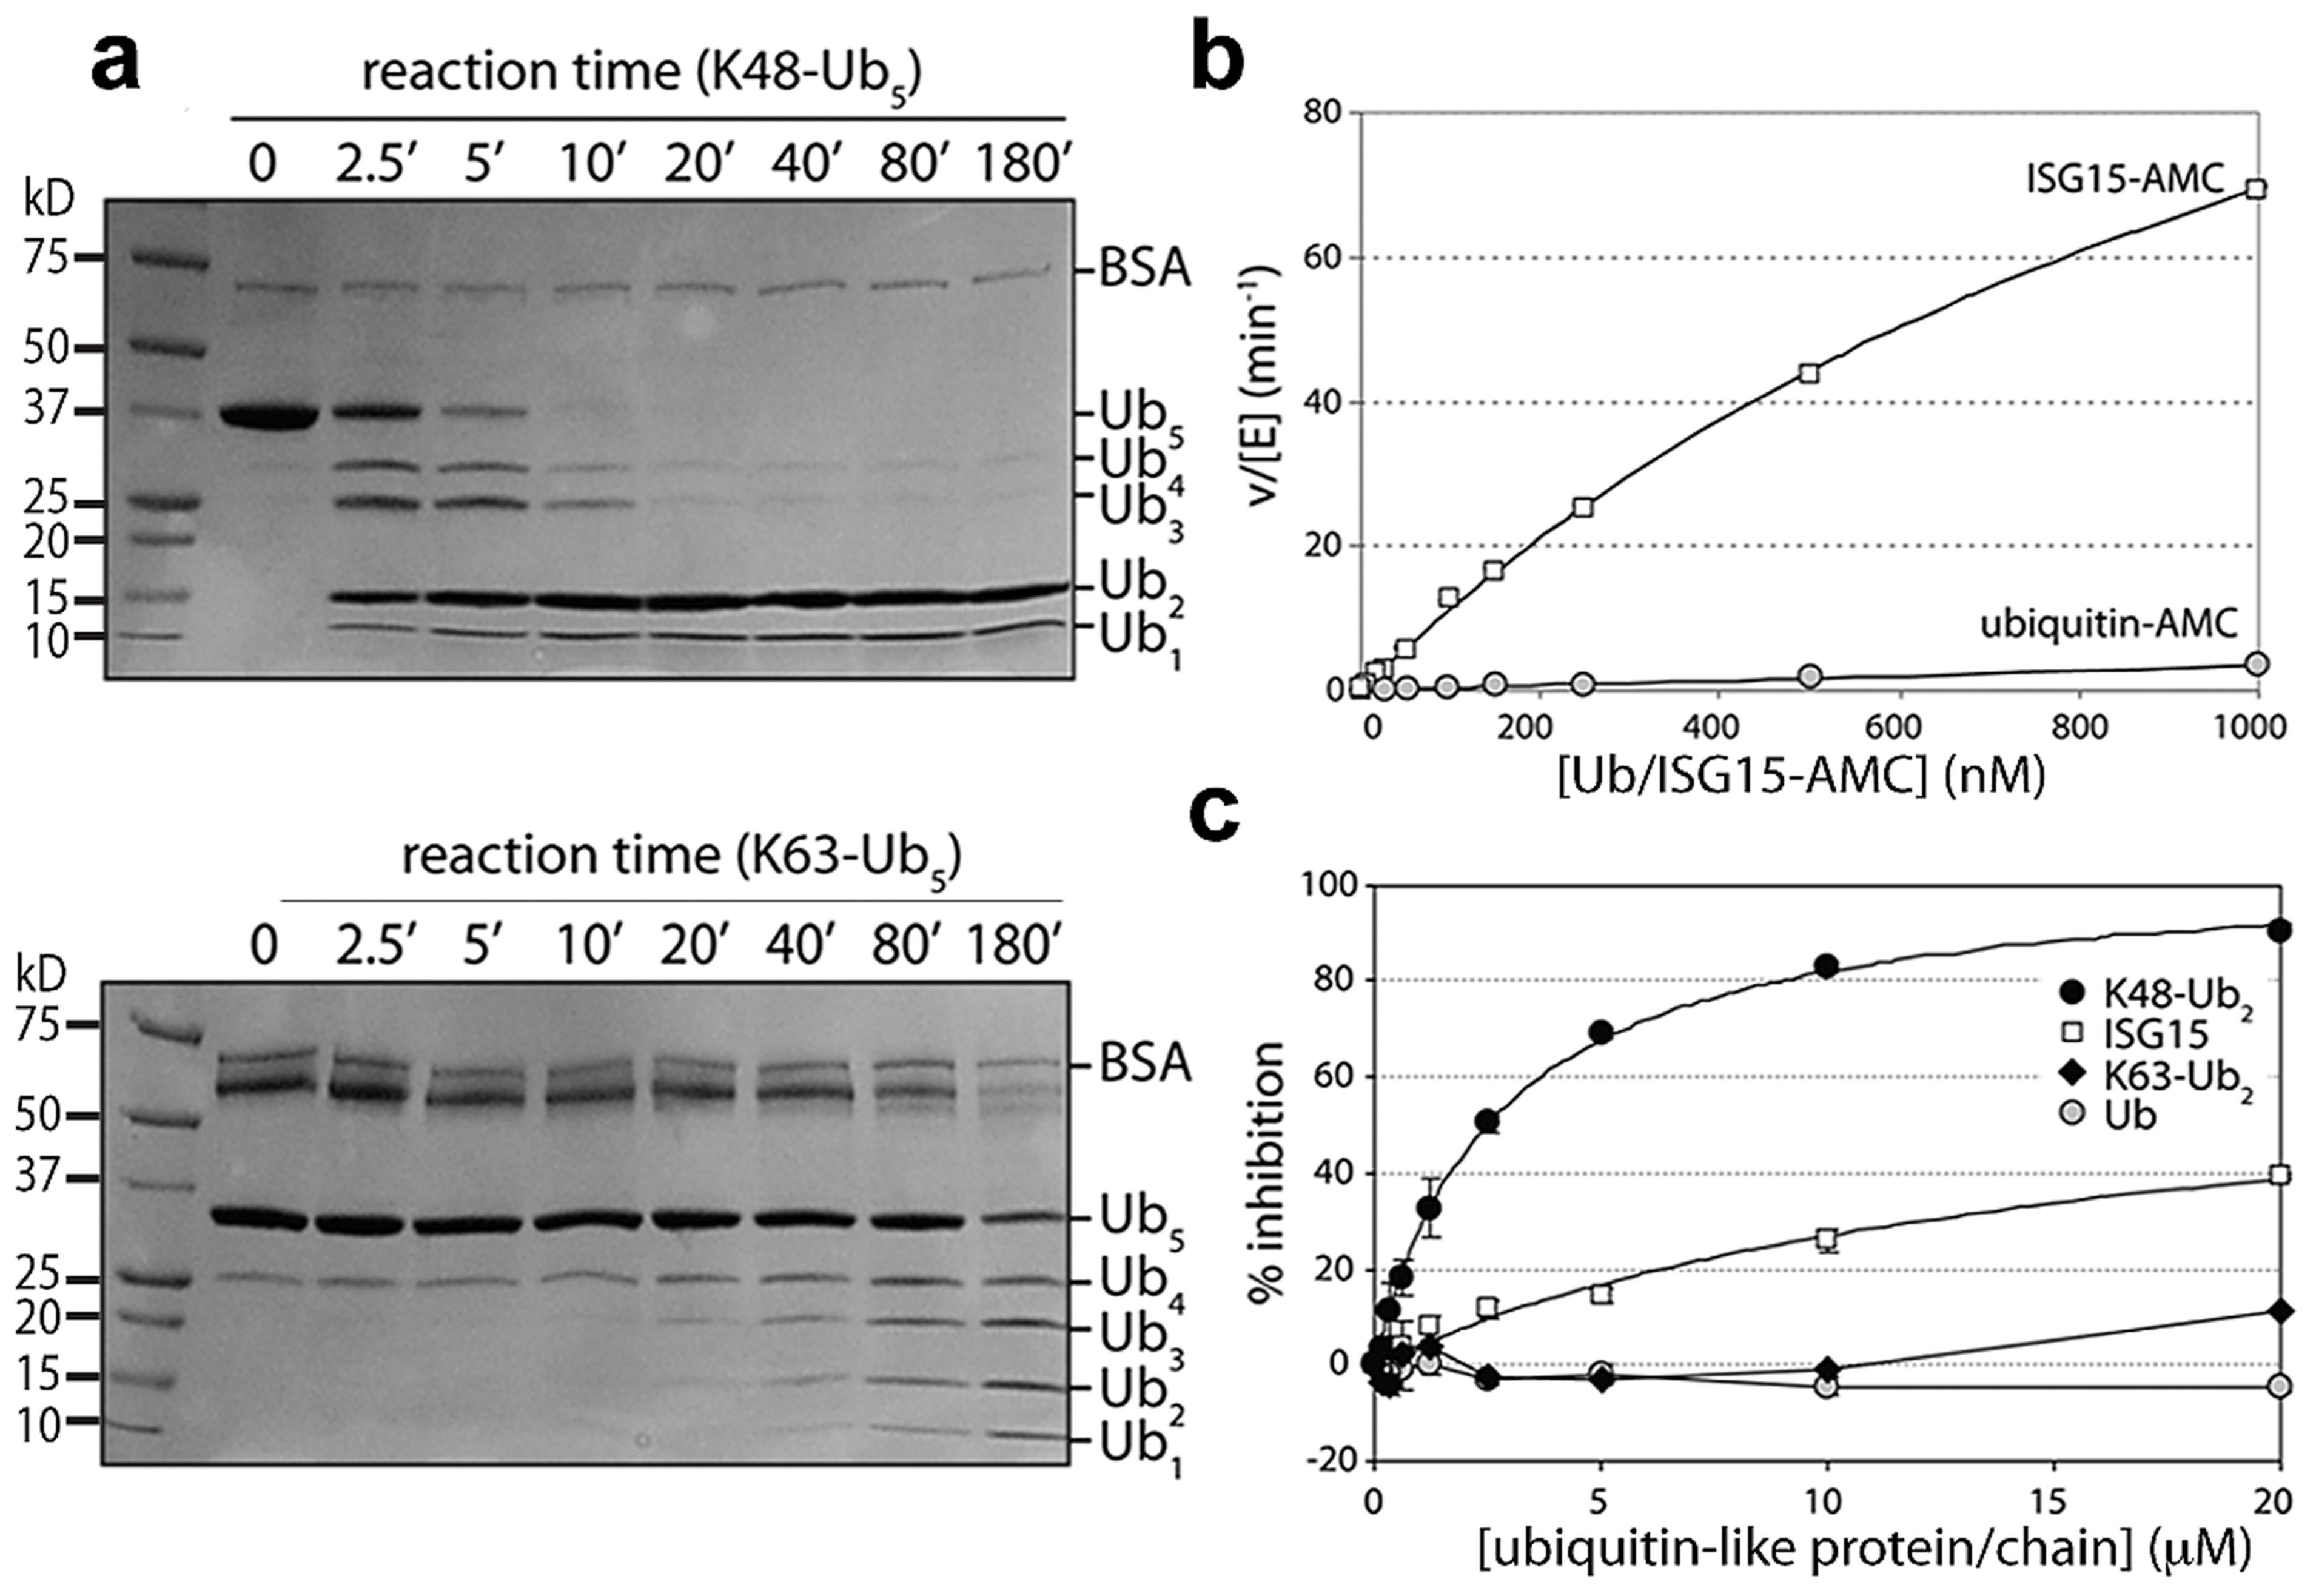 PLpro prefers K48-linked ubiquitin to K63-linked ubiquitin and ISG15 to mono-ubiquitin.